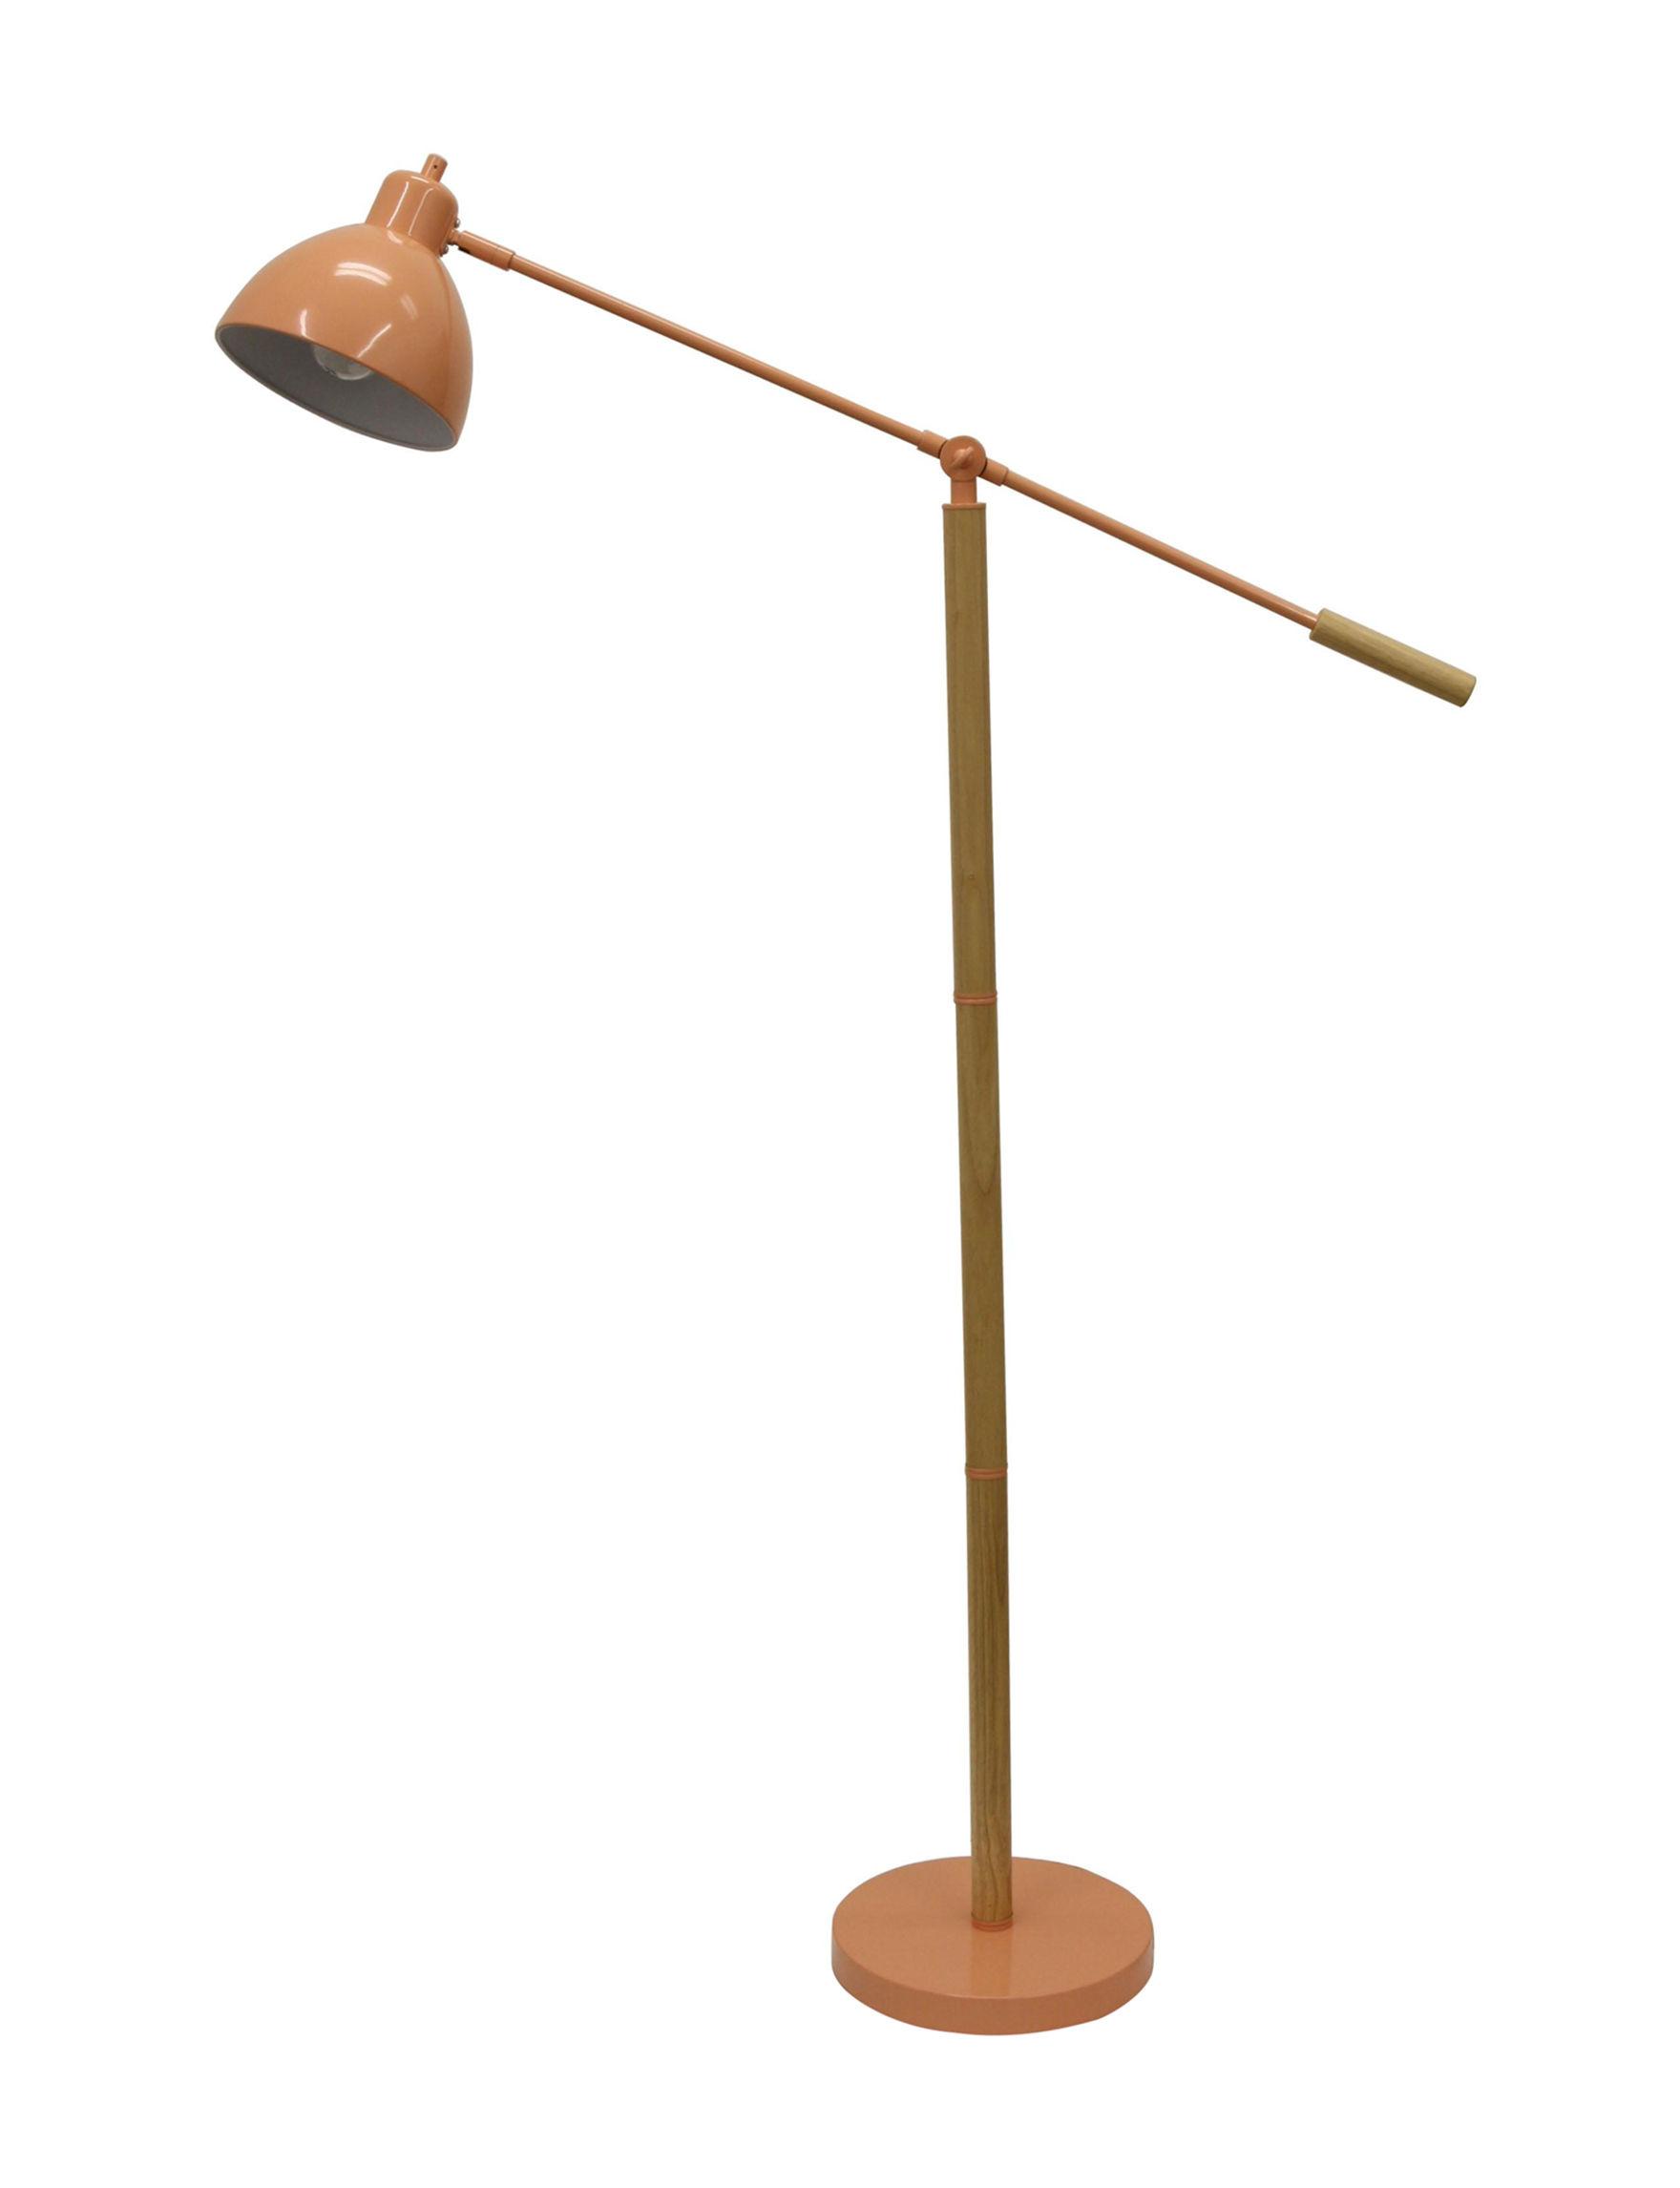 Decor Therapy Orange Floor Lamps Lighting & Lamps